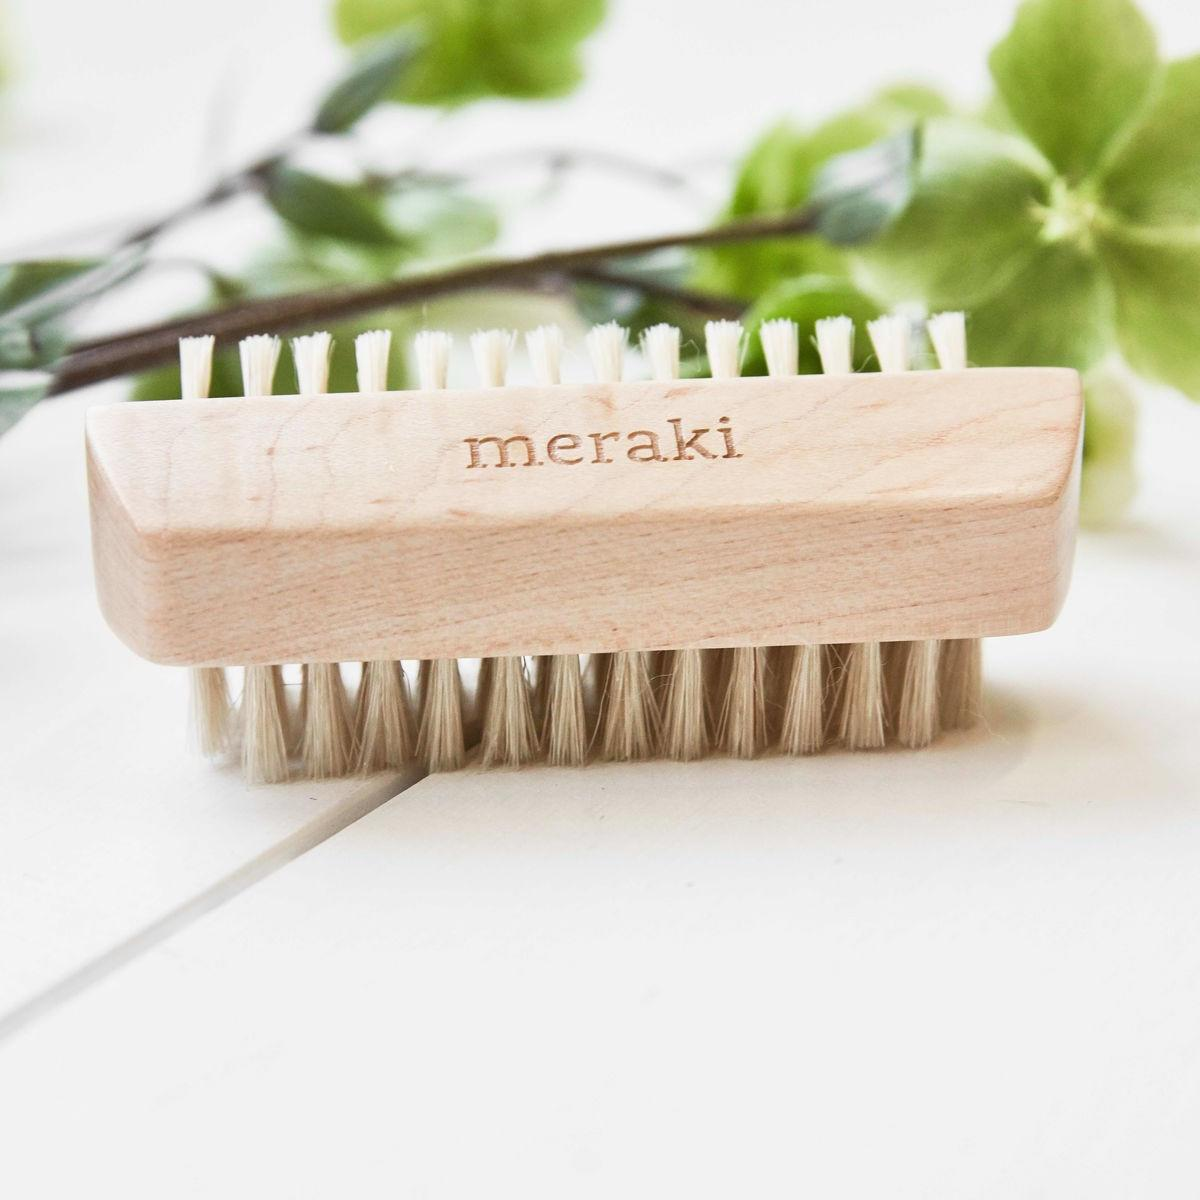 meraki Dřvěný kartáček na nehty Meraki, béžová barva, hnědá barva, dřevo